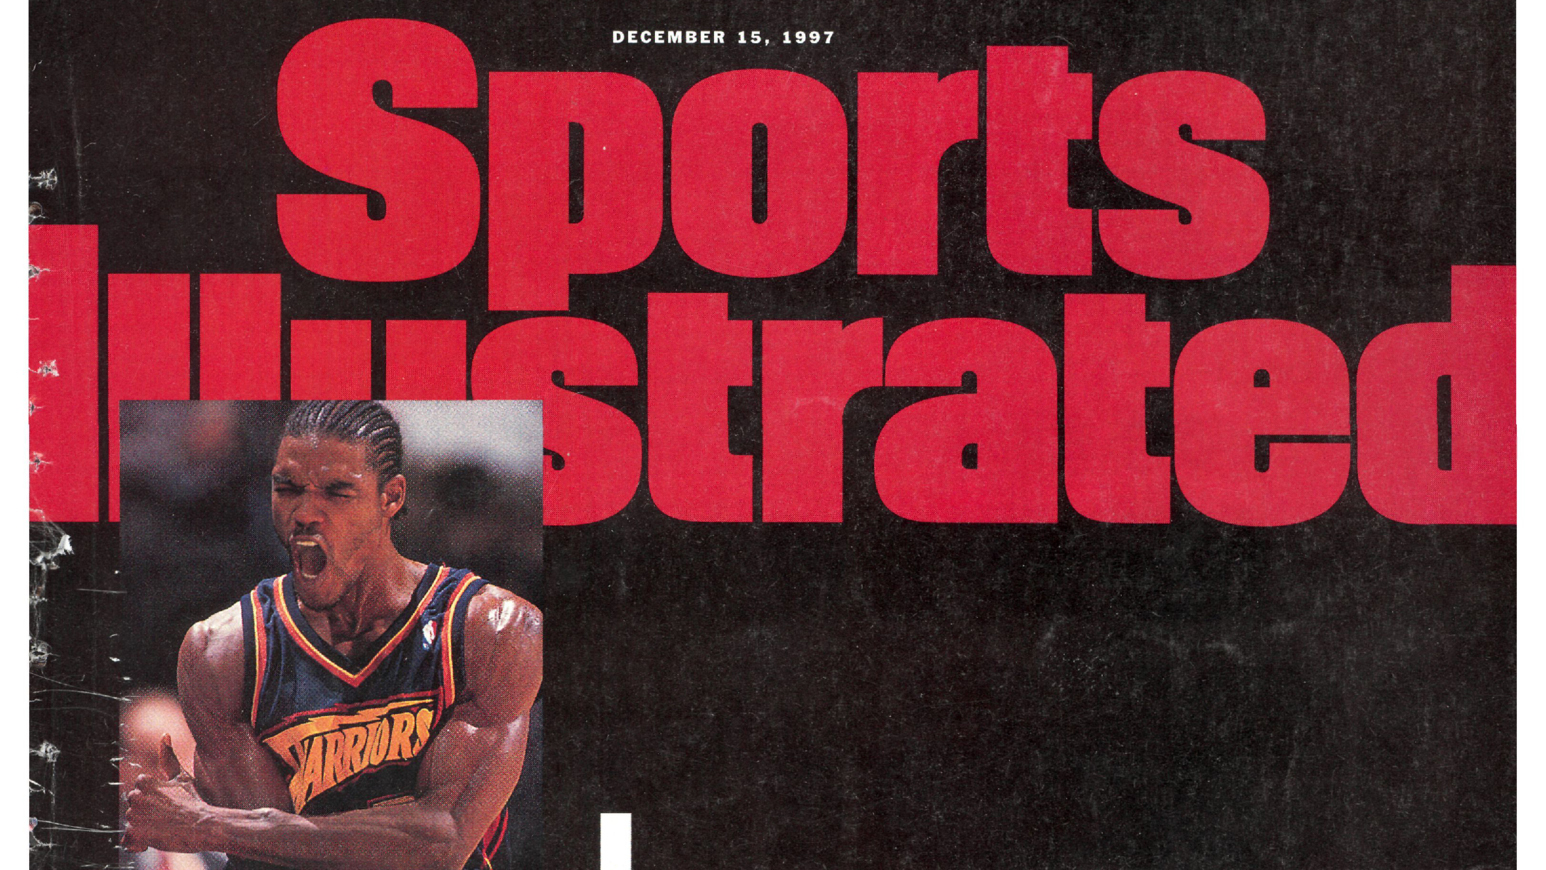 Sports_Illustrated_715369_19971215-001-2048